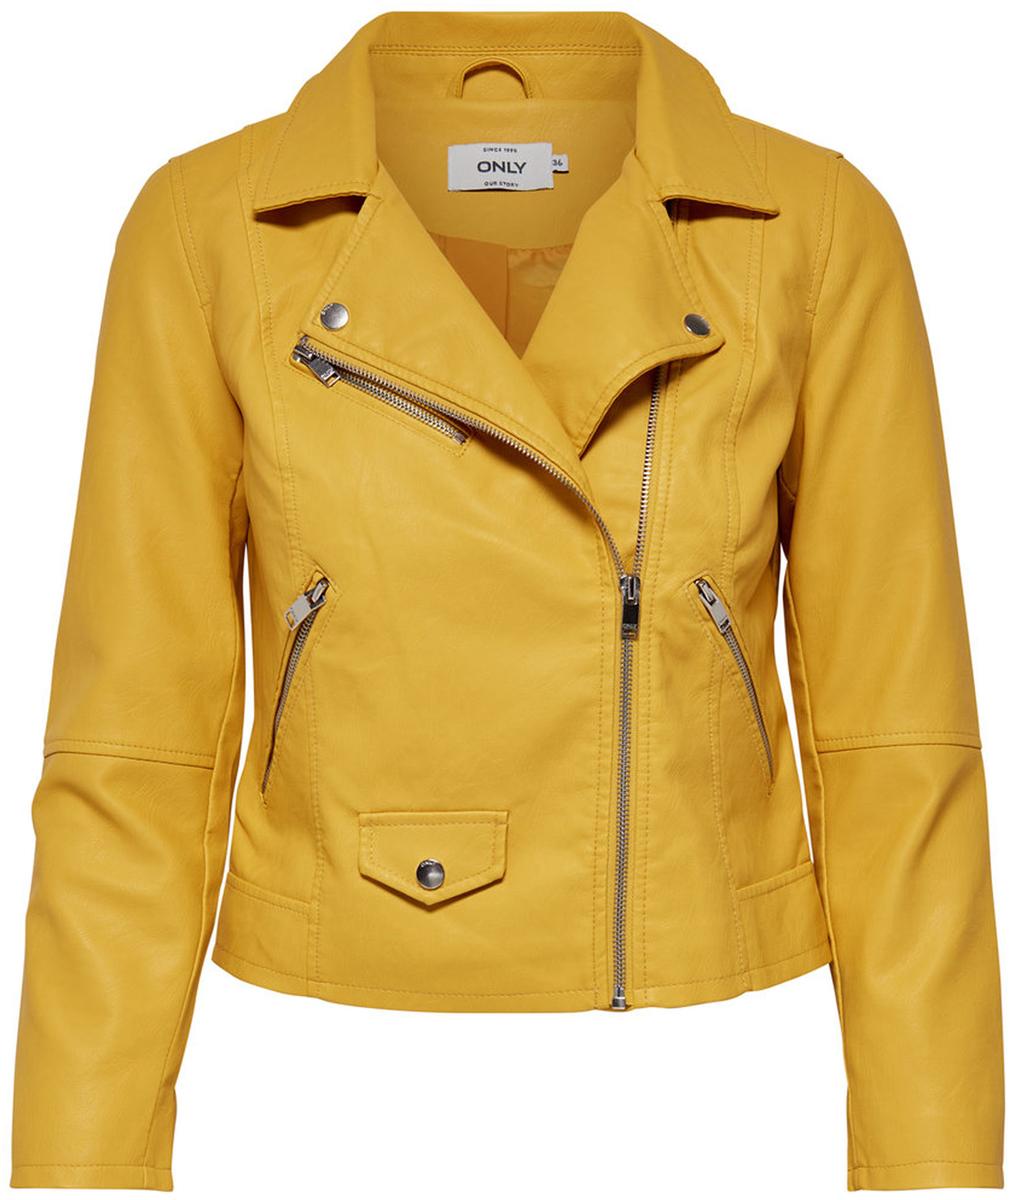 Купить Куртка женская Only, цвет: желтый. 15144751_Yolk Yellow. Размер 38 (44)